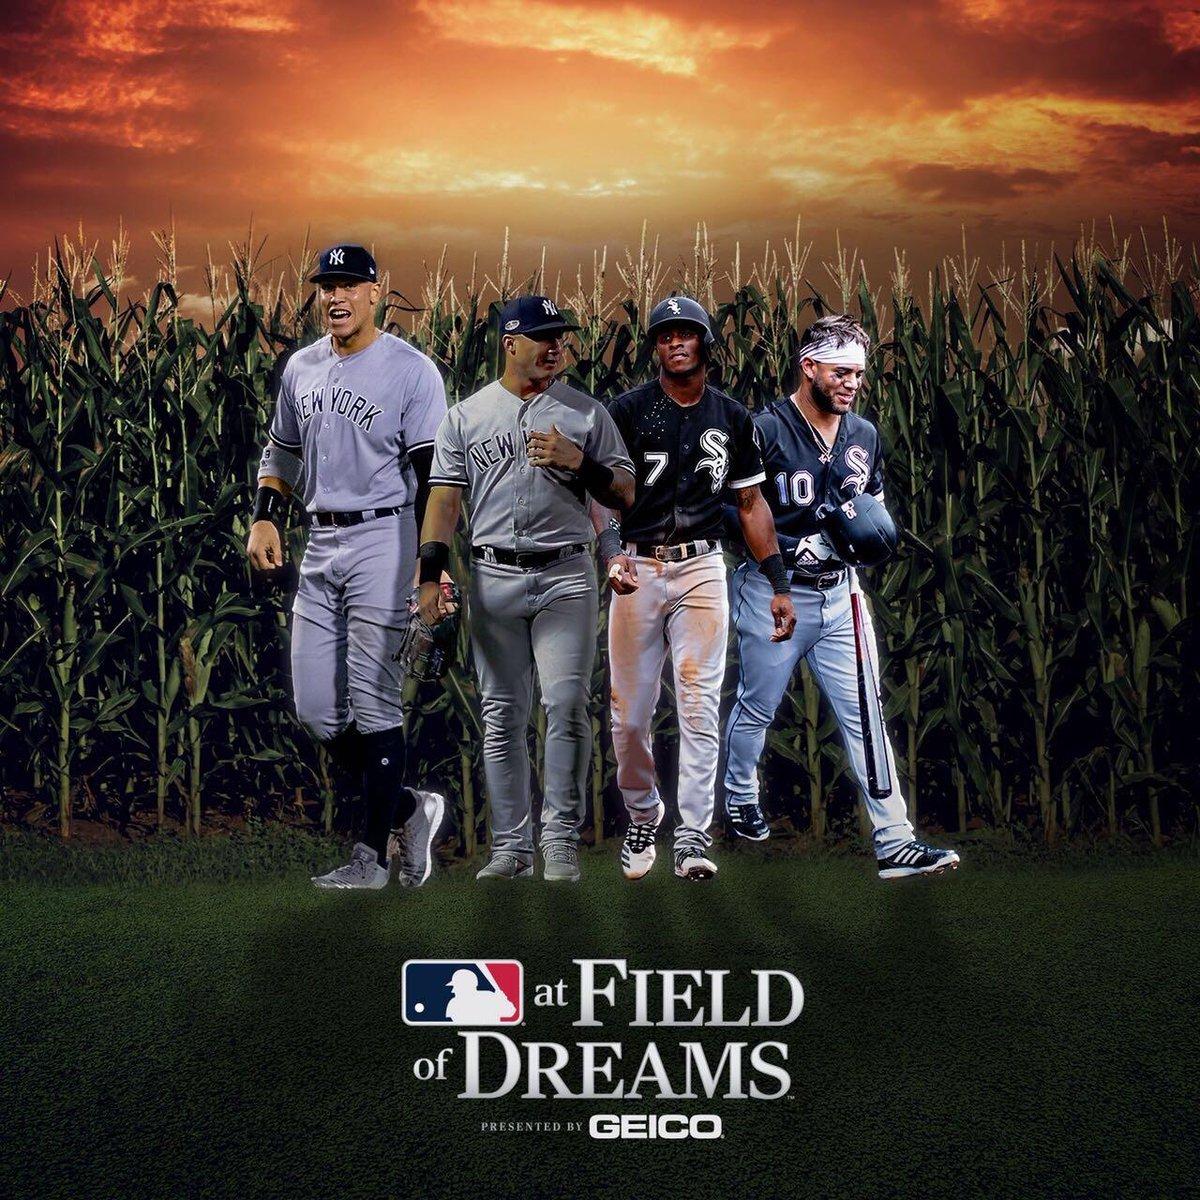 MLB to Play Regular Season Game at 'Field of Dreams' Site